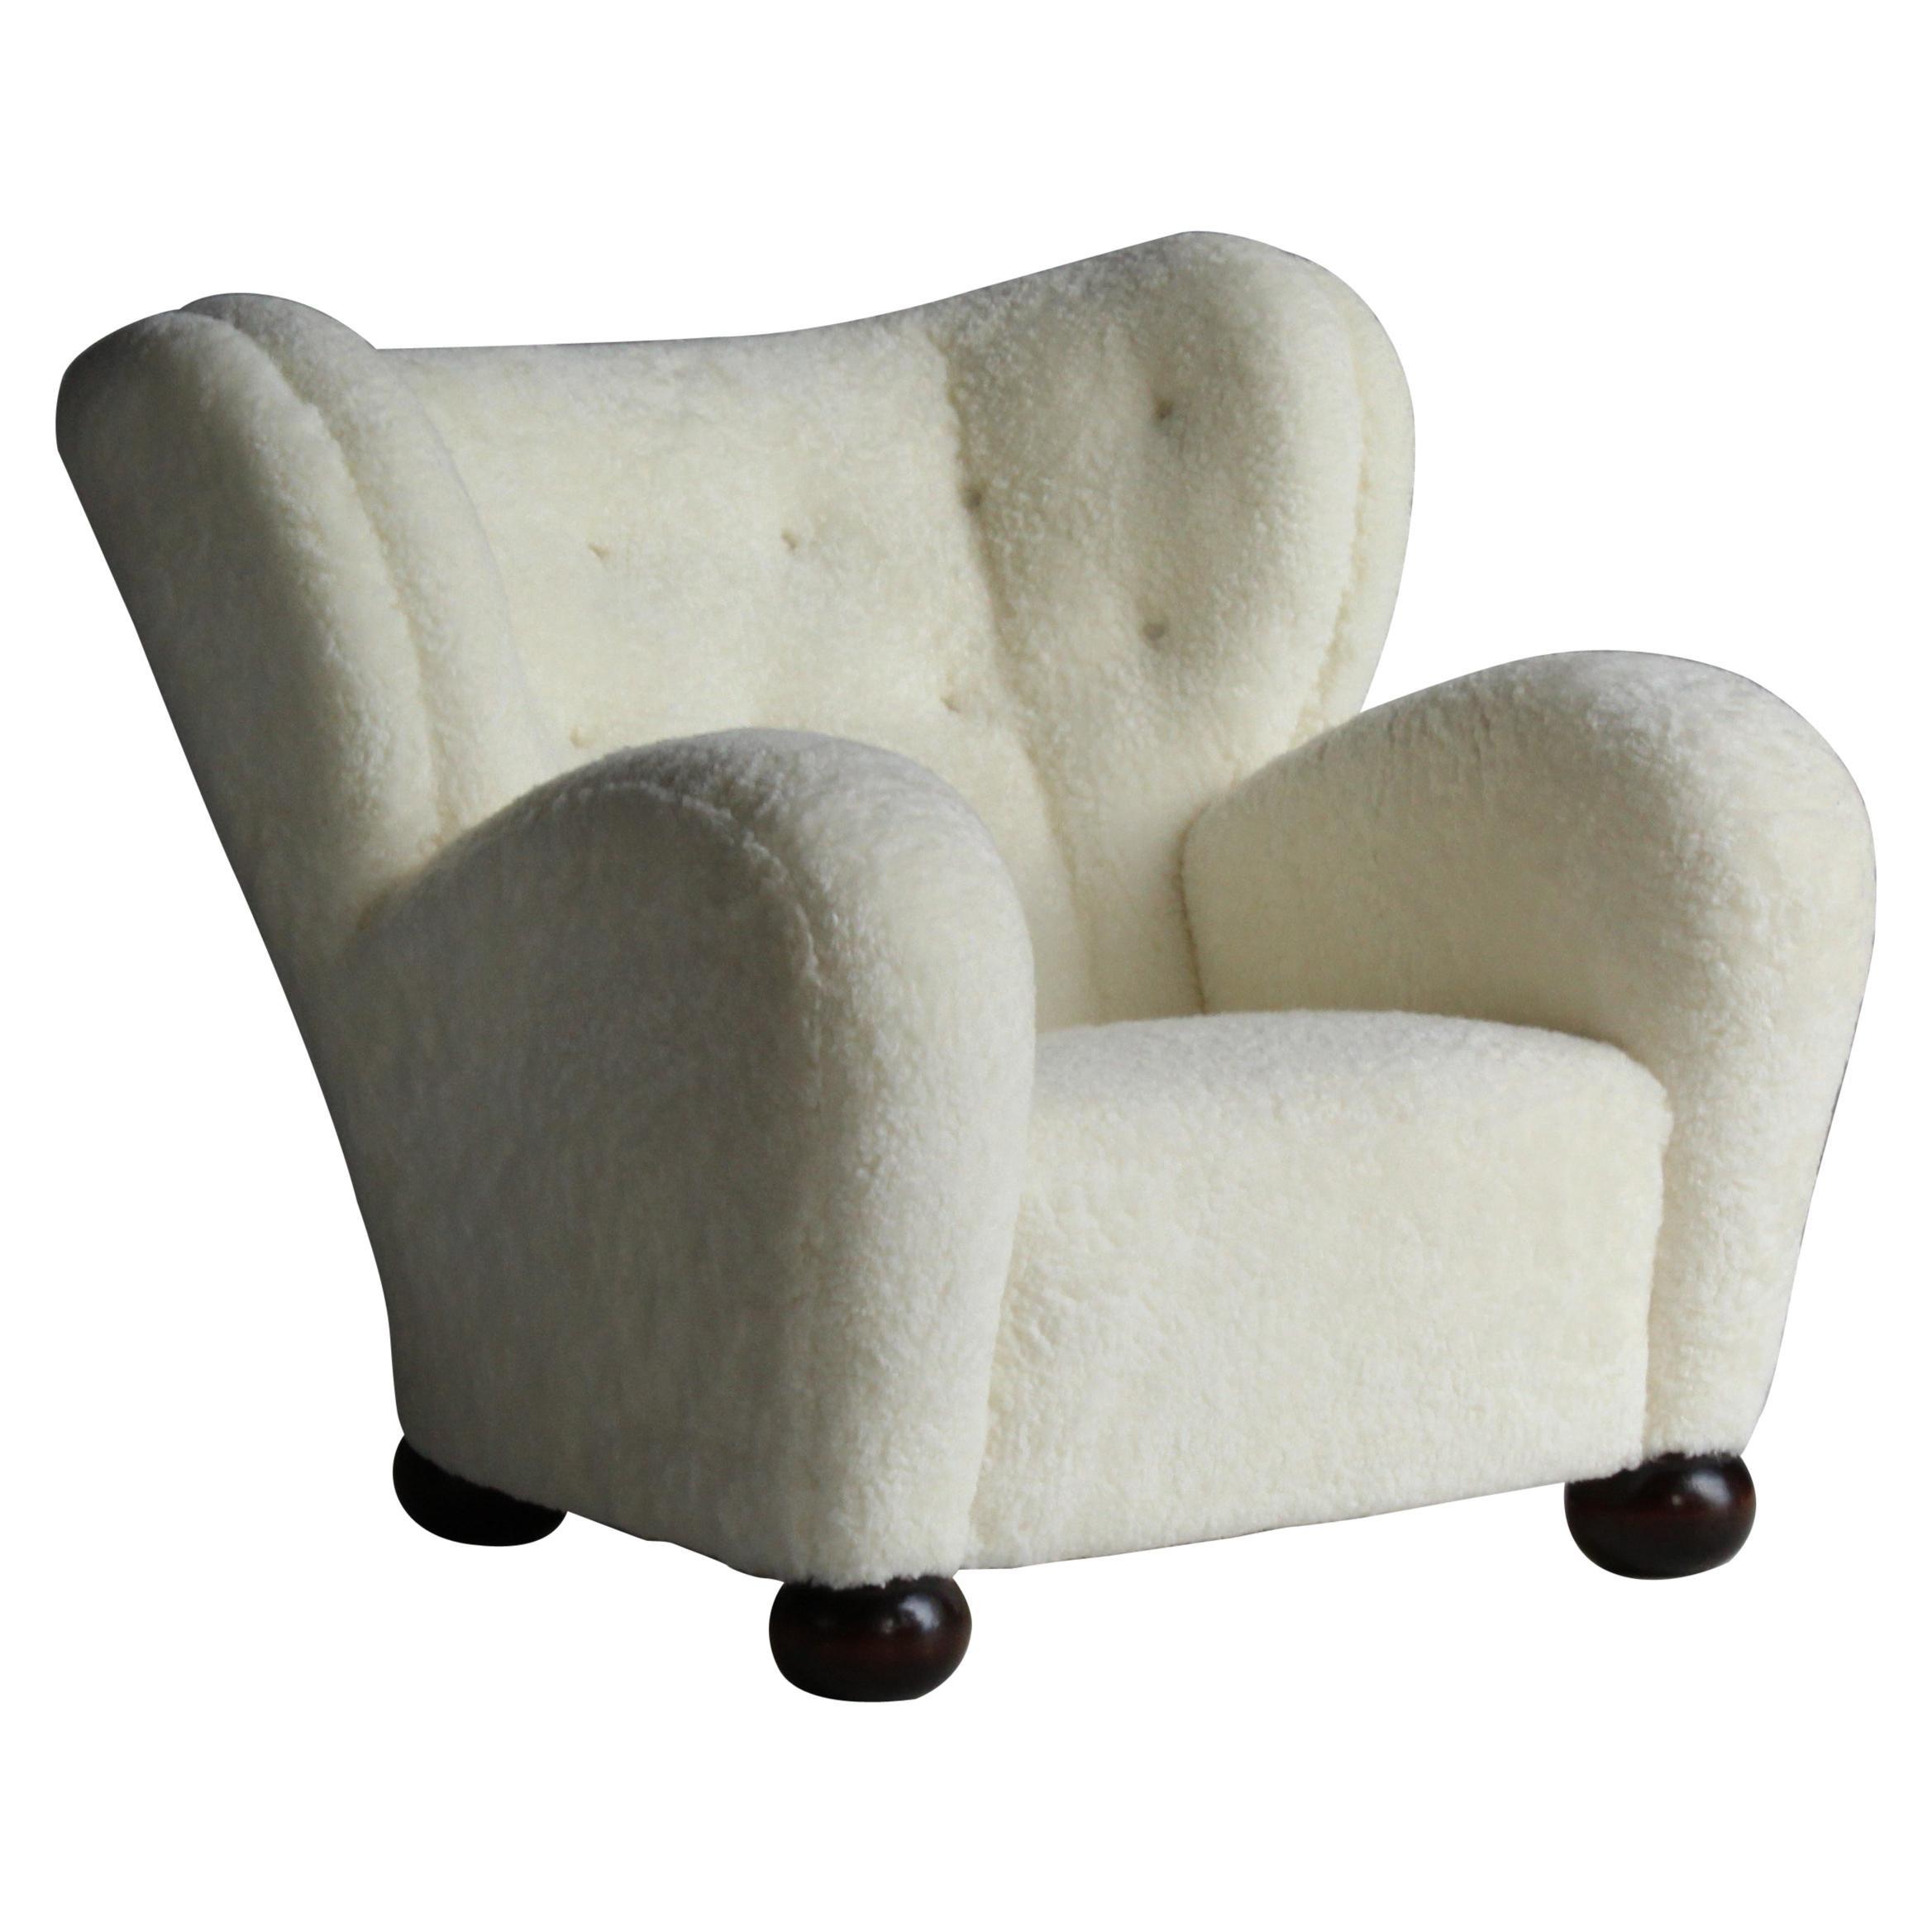 Märta Blomstedt, Lounge Chair Designed for Hotel Aulanko, Sheepskin, Birch, 1939